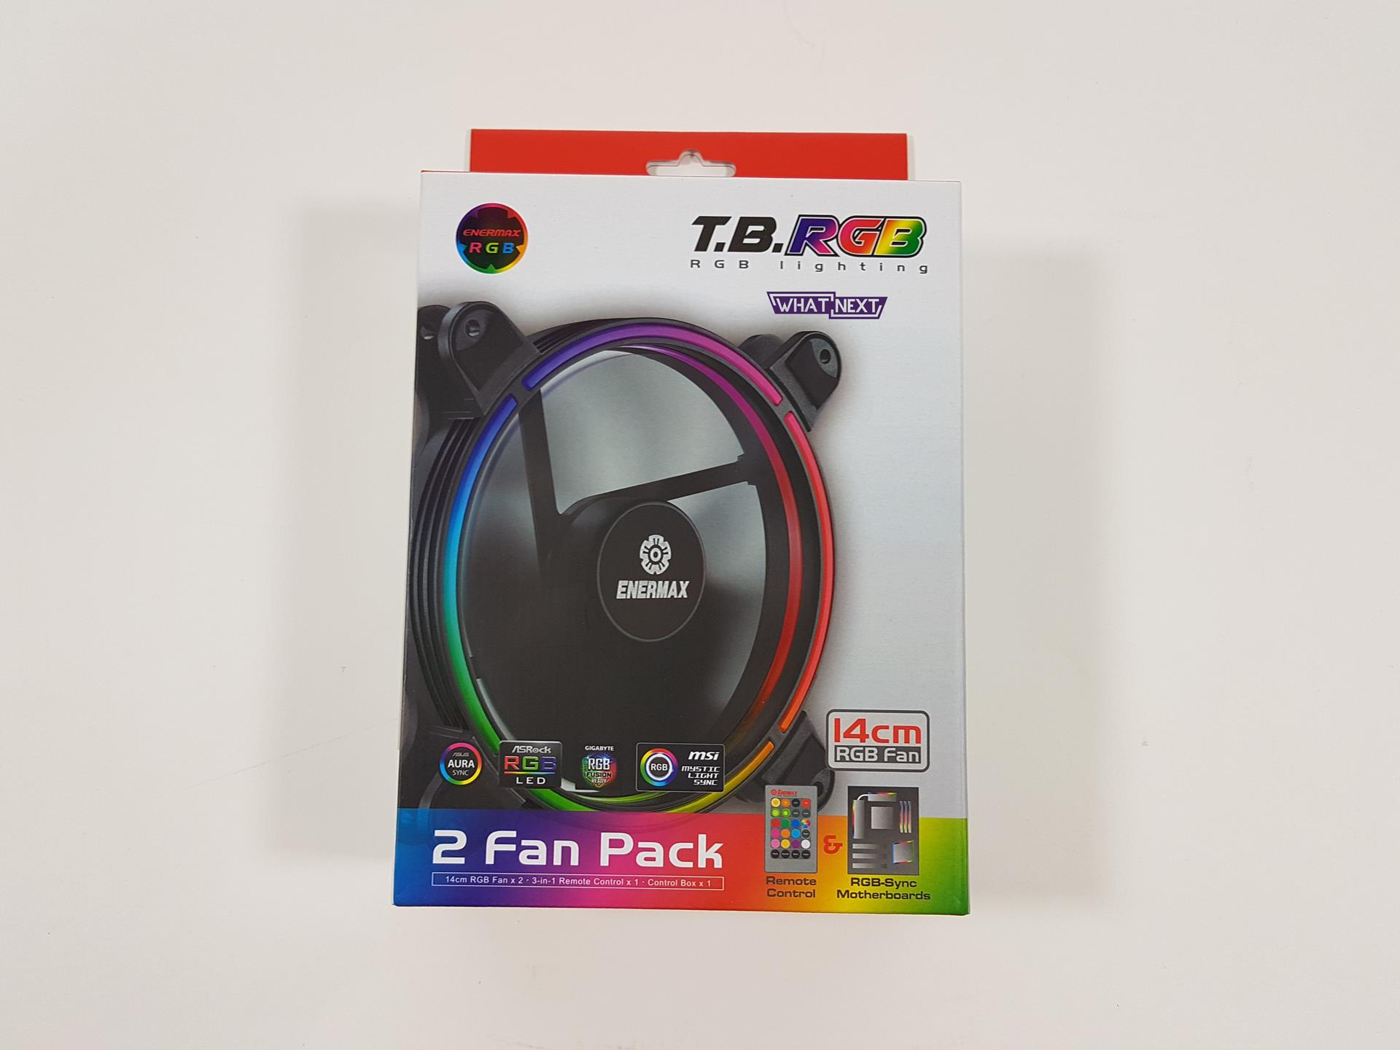 Test wentylatorów Enermax T.B.RGB 14 cm 2 Fan Pack